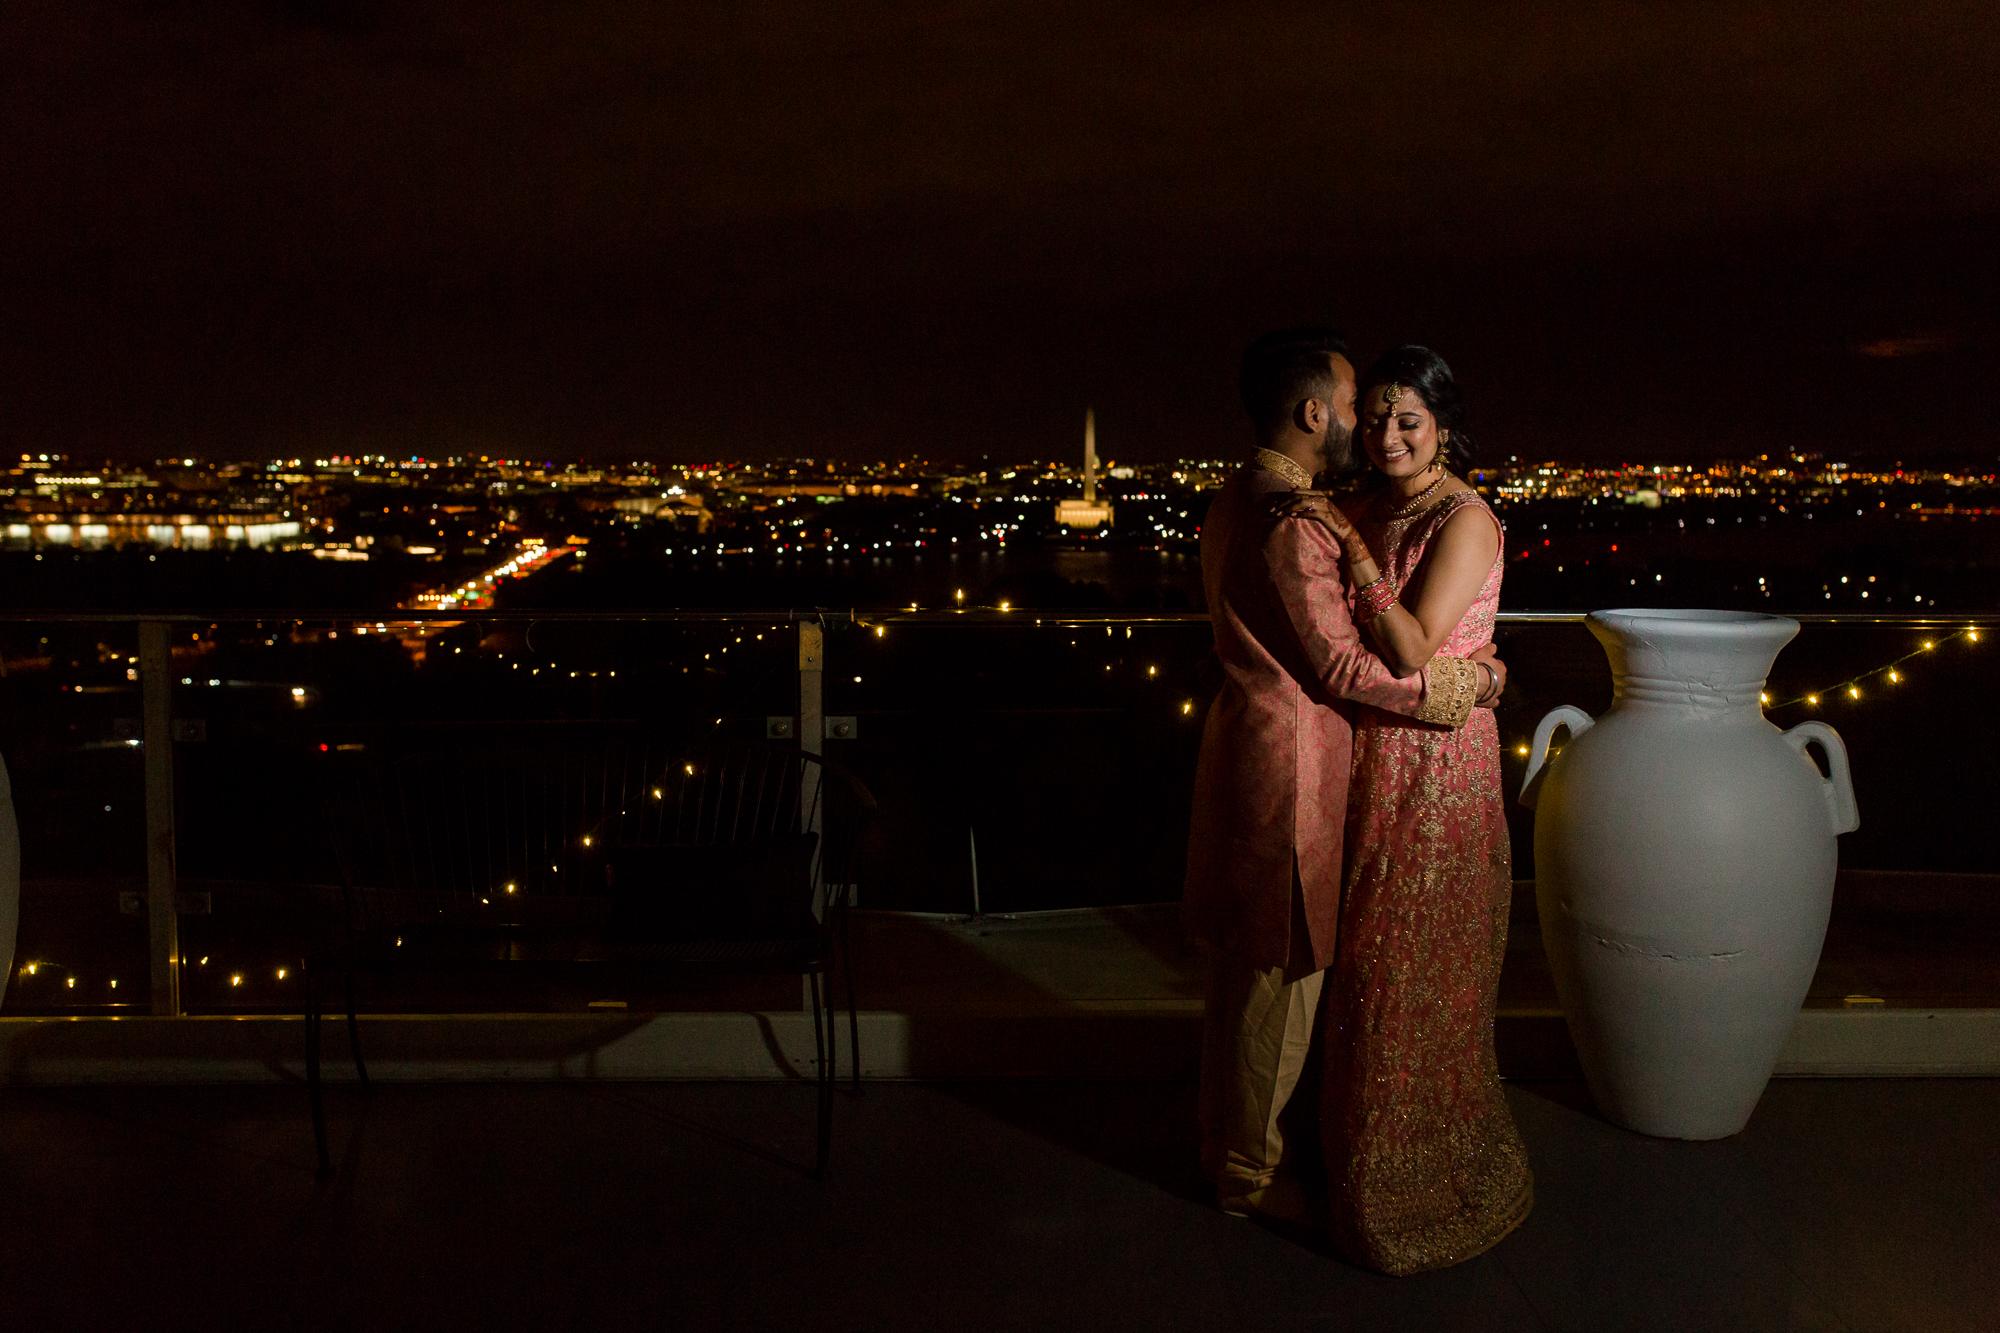 anumeet and gopika, indian engagement ring ceremony, top of the town, alexandria, northern virginia, nova weddings-115.jpg